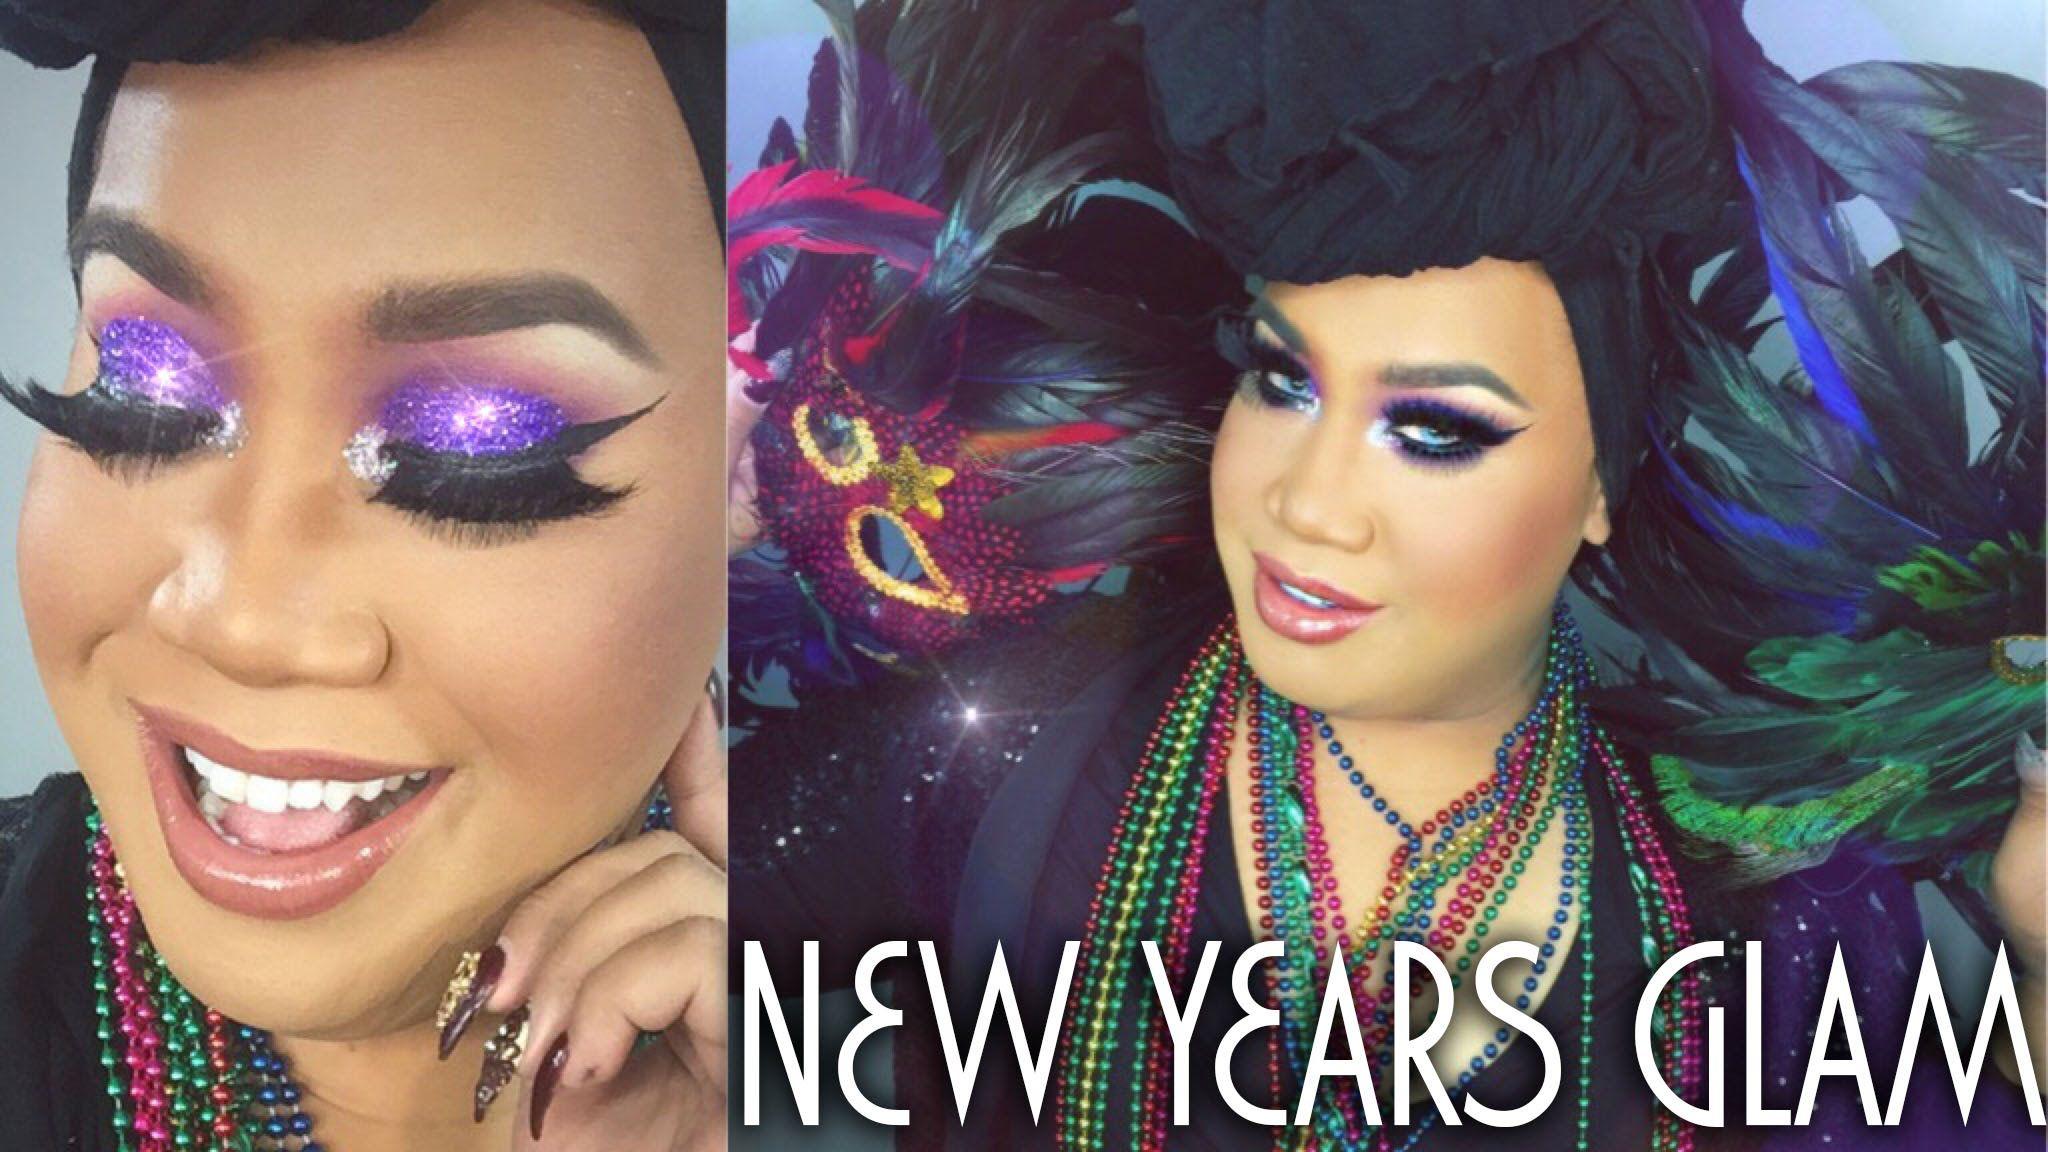 New Years Eve Glam Makeup Tutorial ★ PatrickStarrr